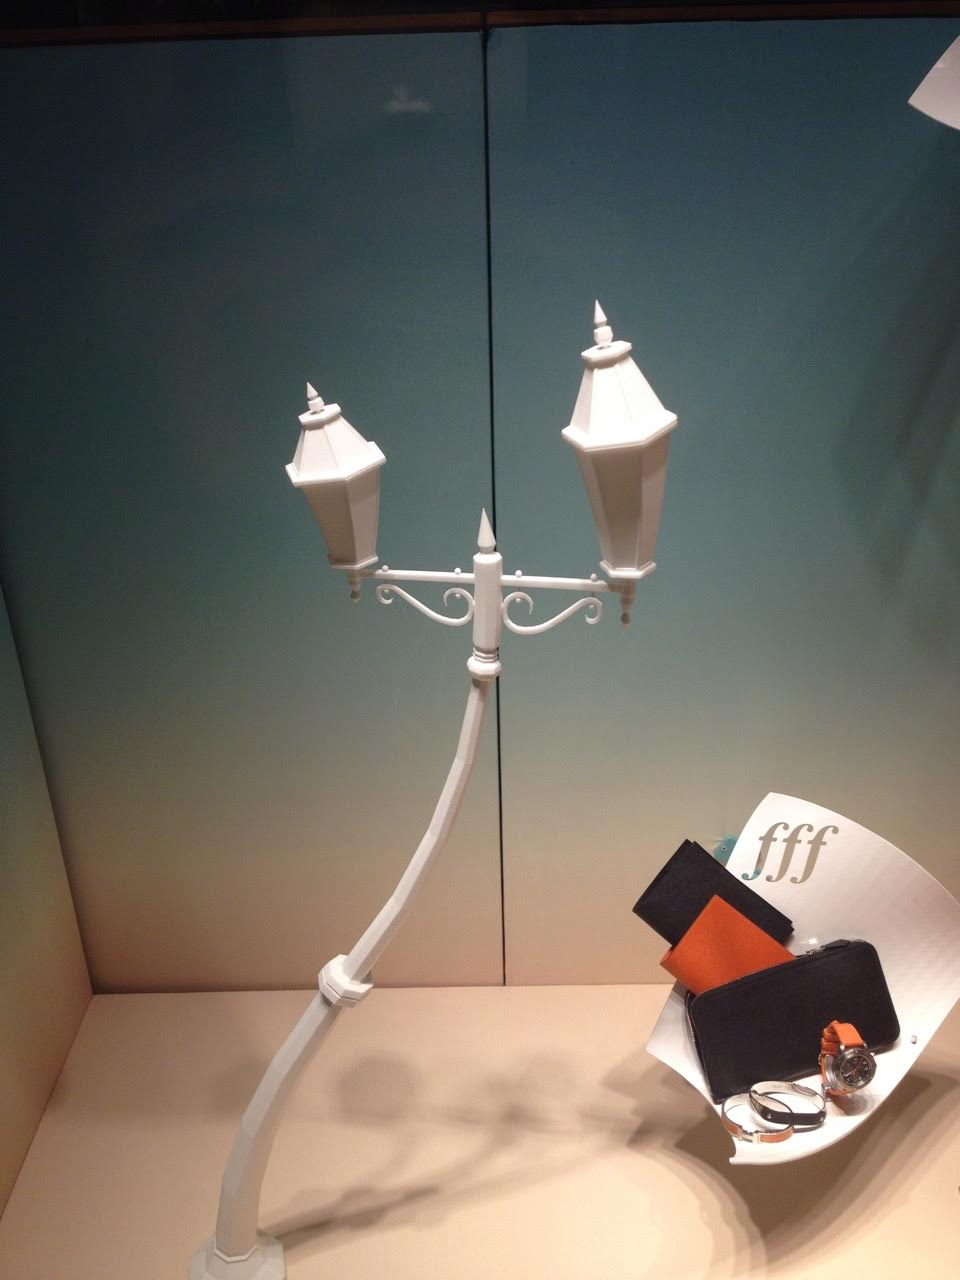 objet impression 3d hermès